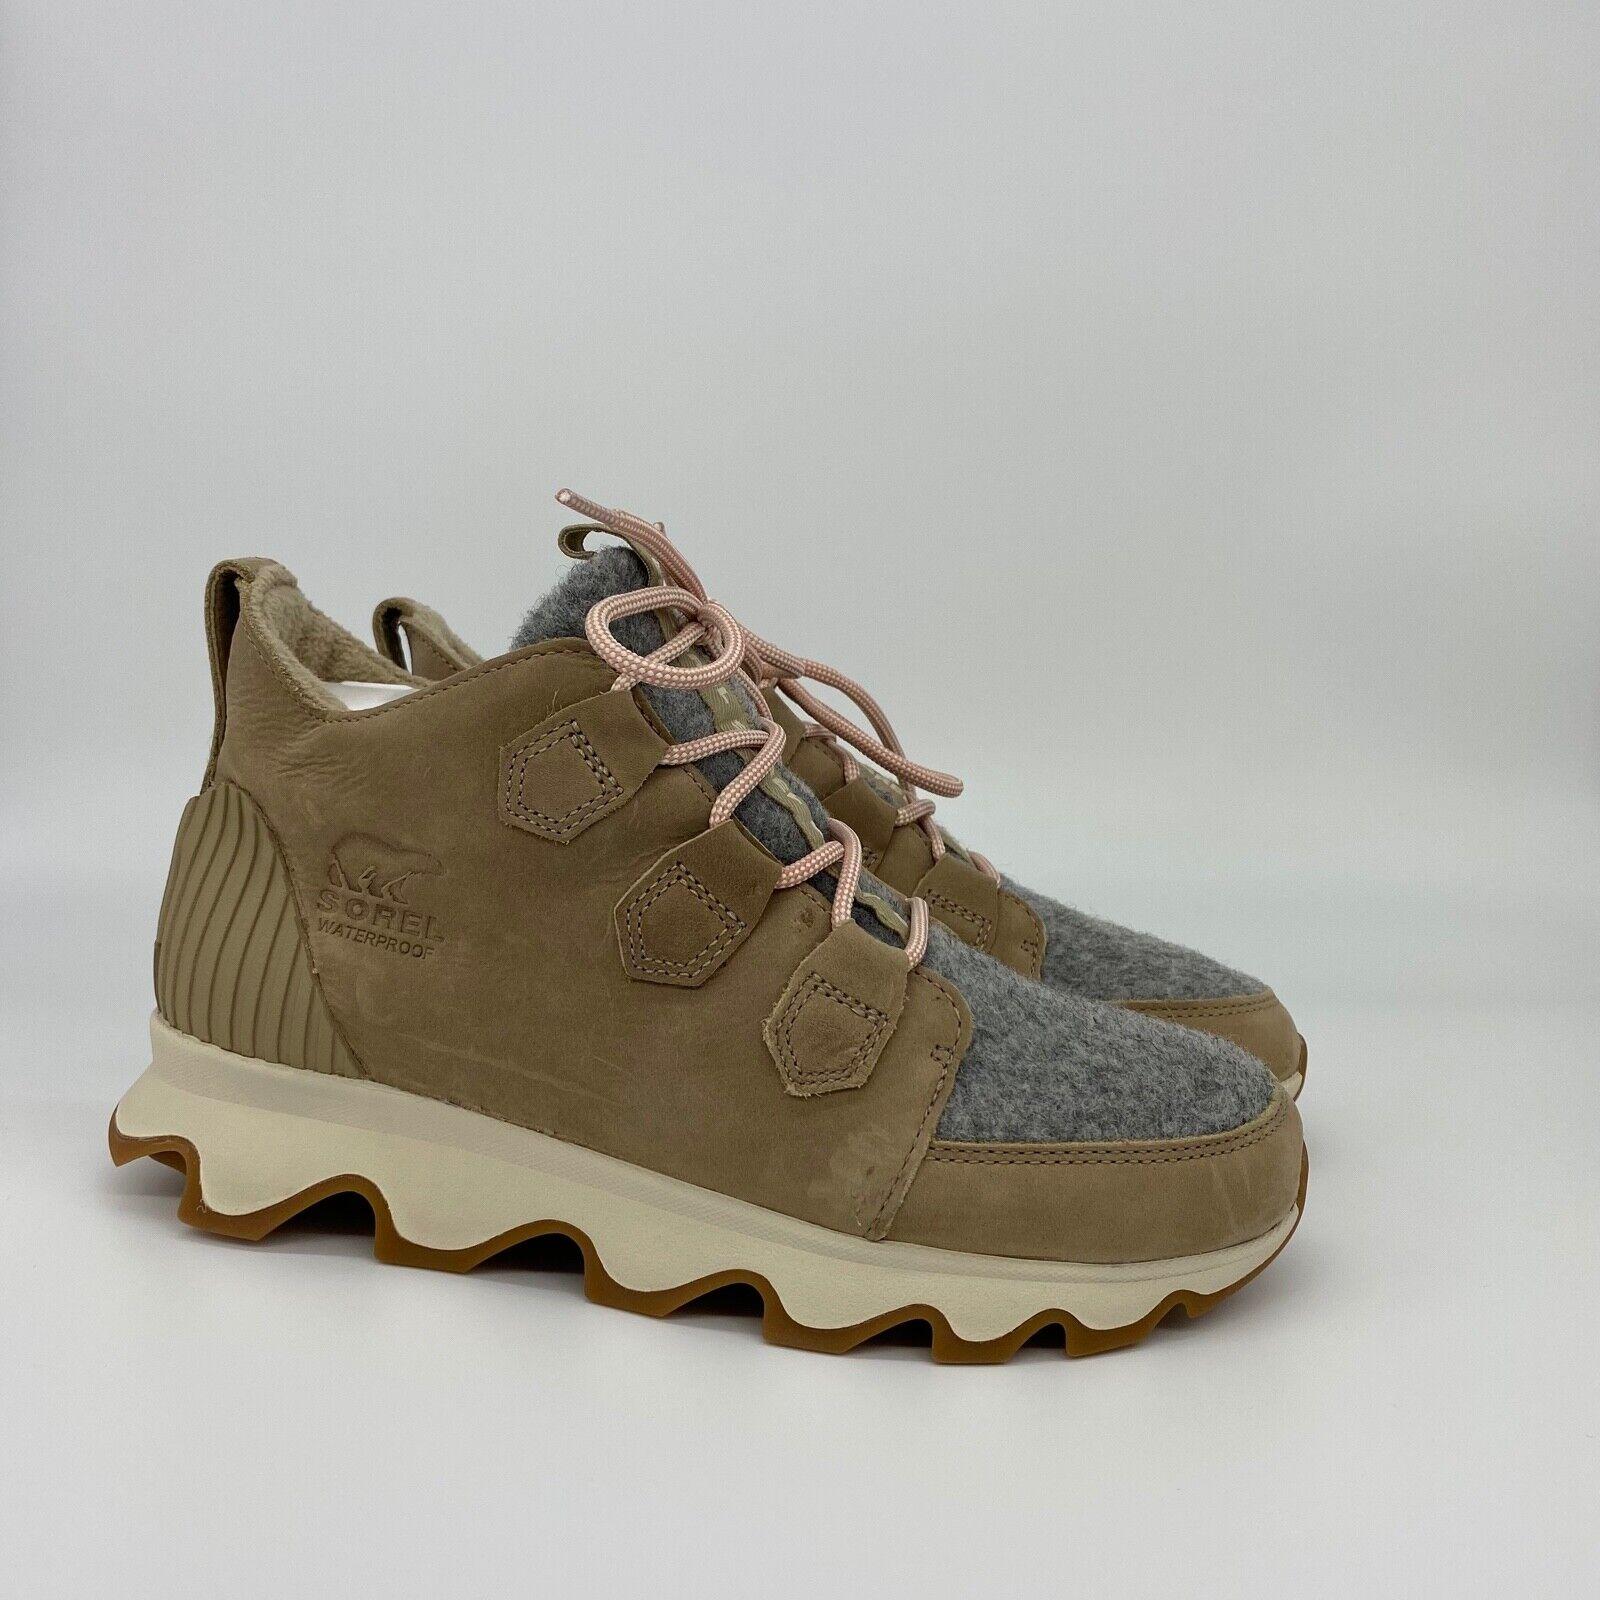 Sorel Kinetic Caribou Boots Sneakers Sandy Tan NEW Women's Sorel Boots